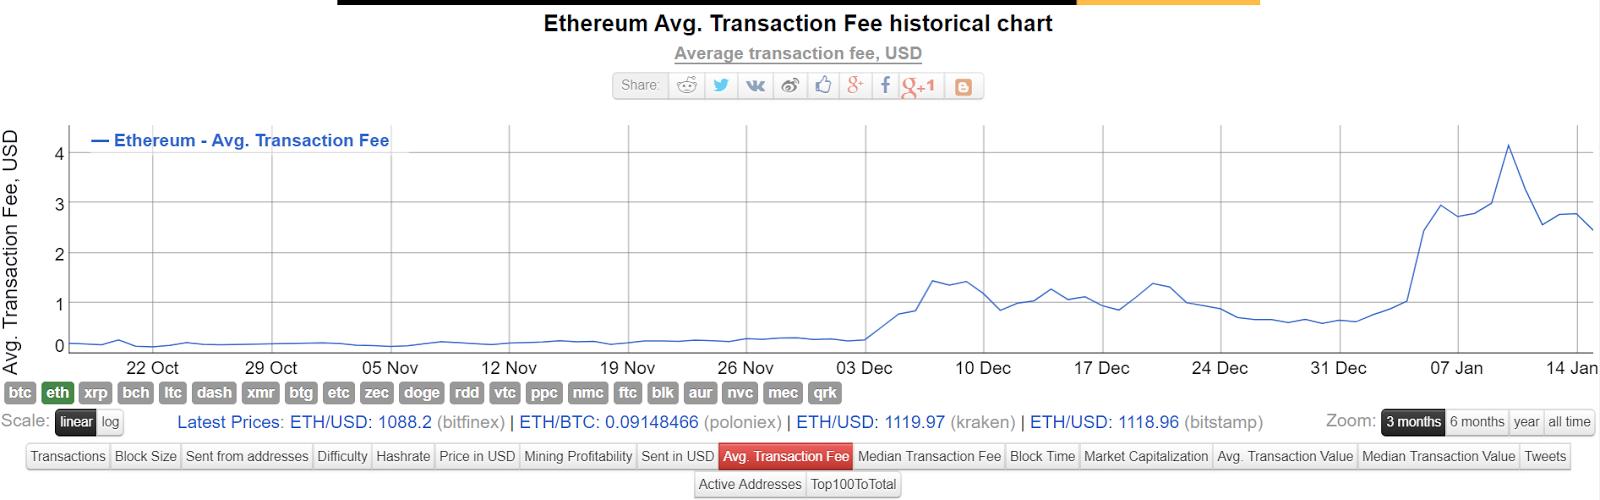 Bitcoin Time To Find Block Calculator Bitcoin Pool Fees – kinobey